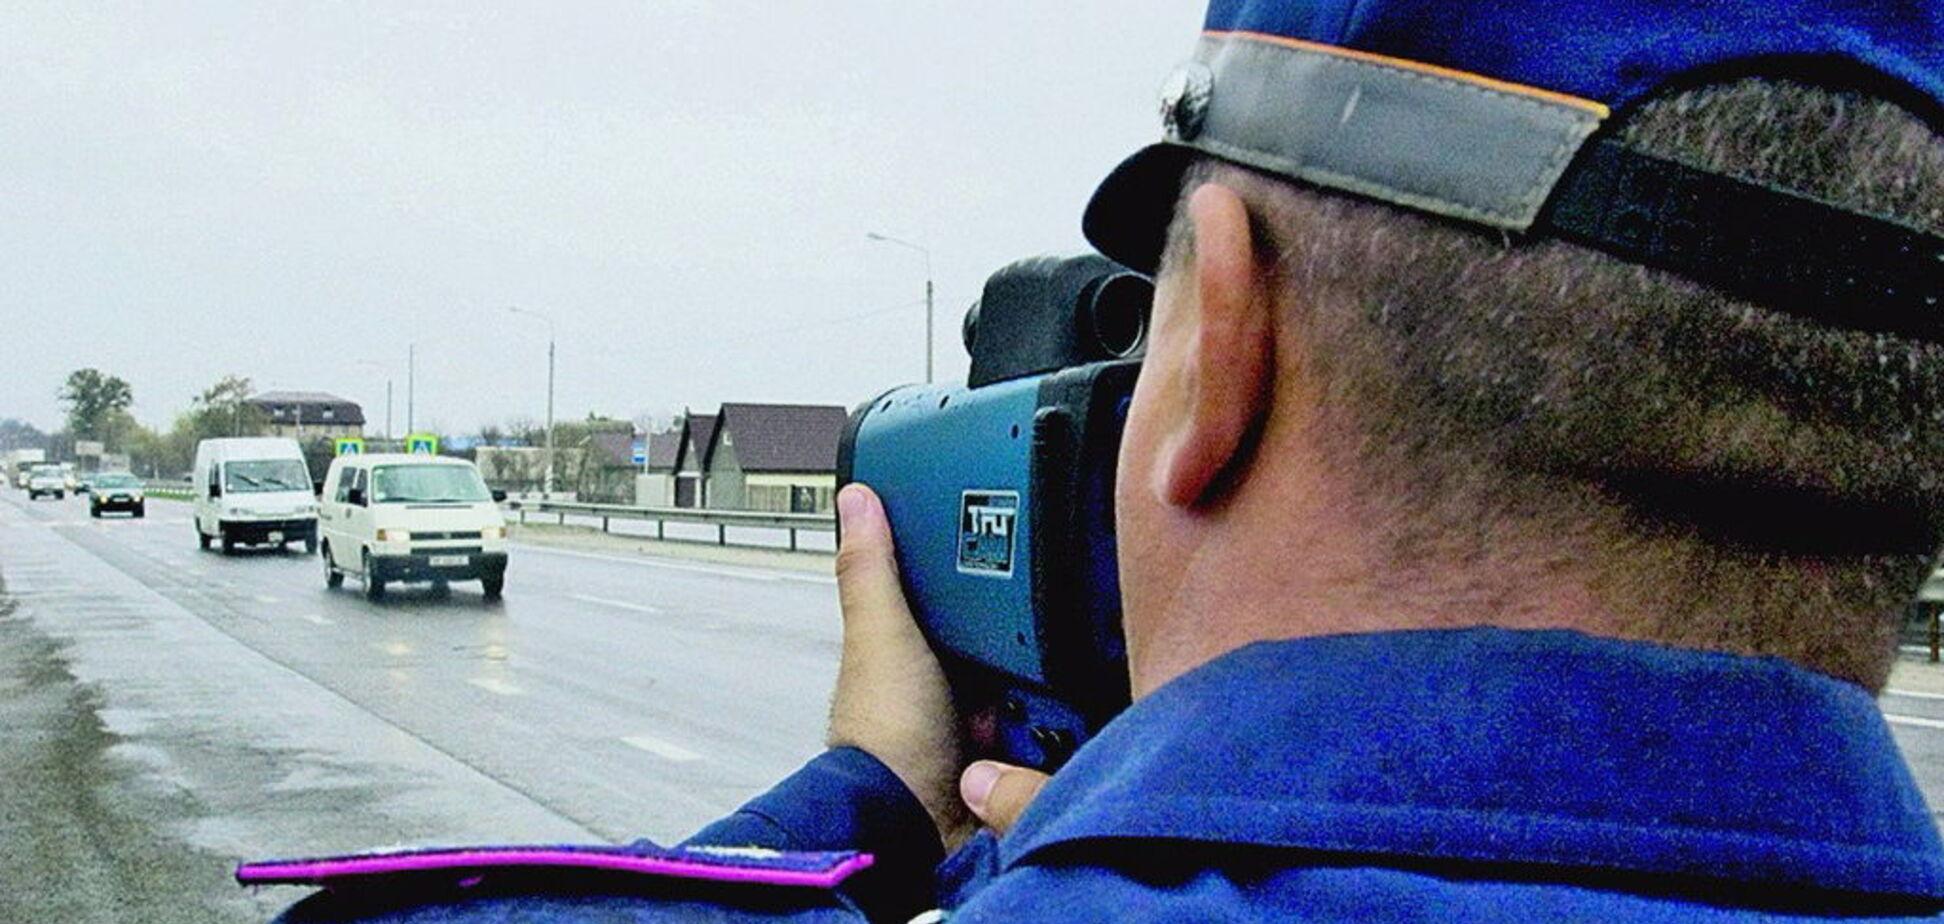 Радары на дорогах Украины: развенчаны популярные мифы